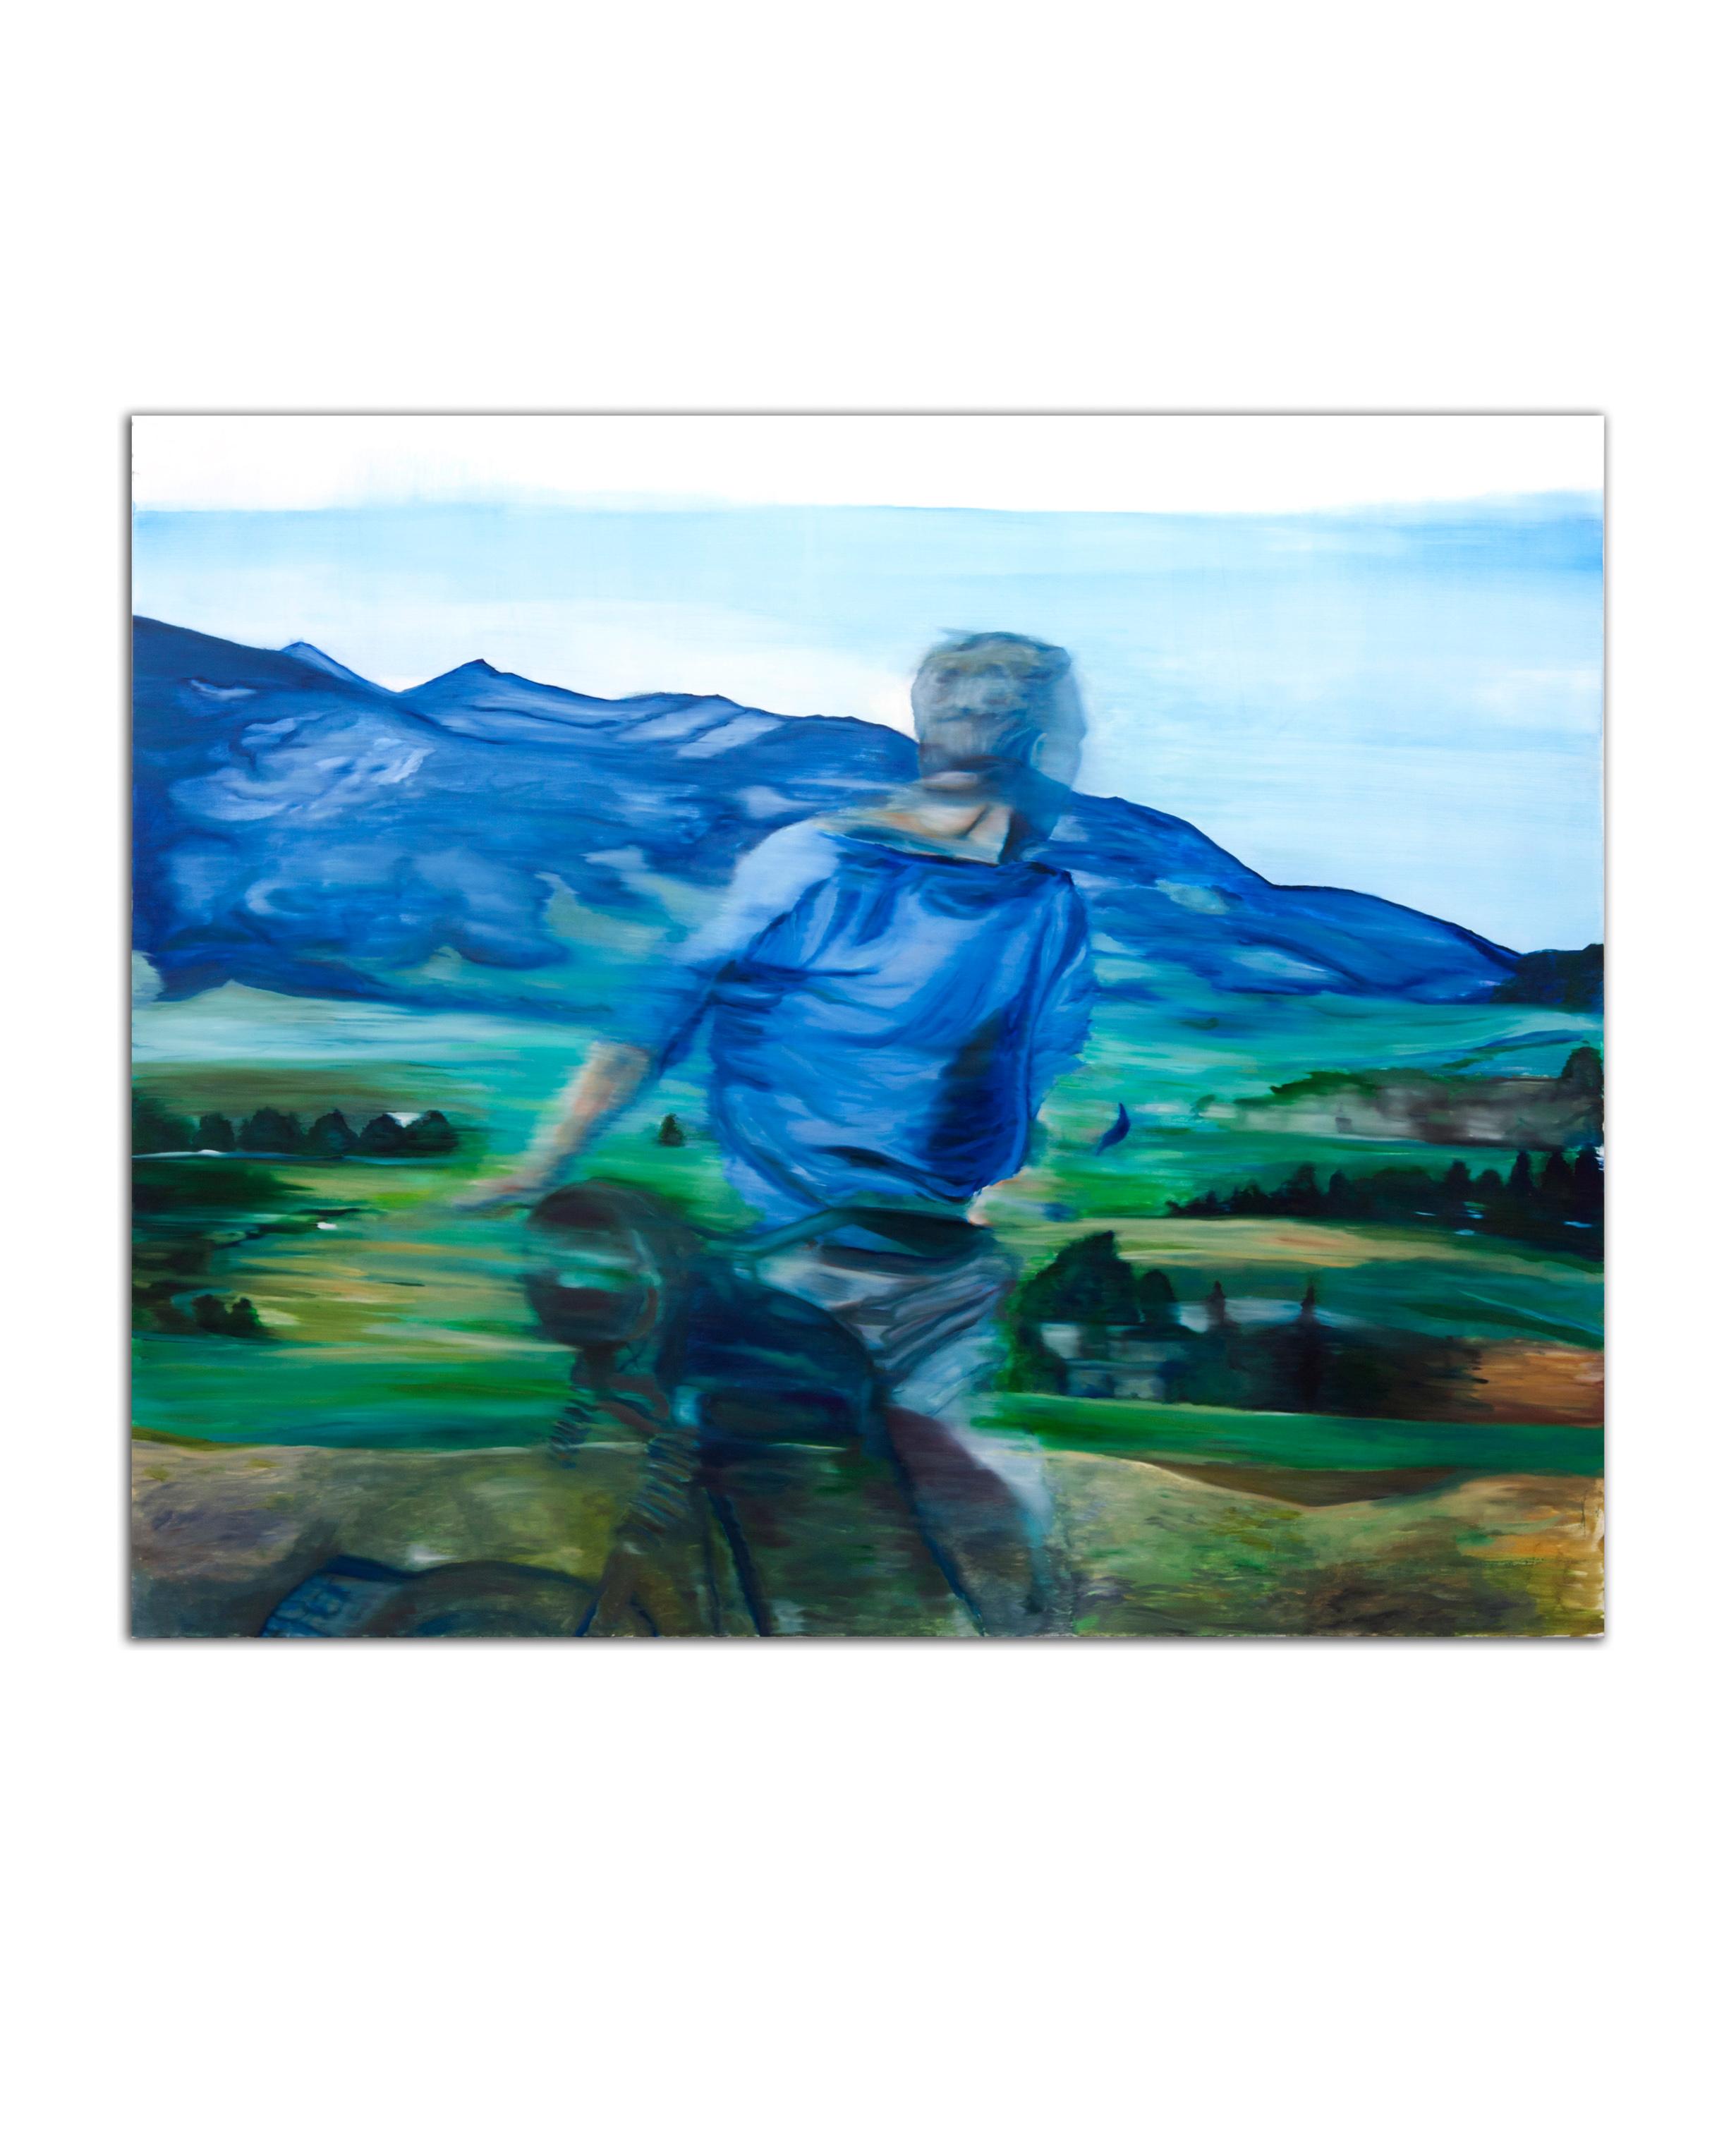 Faster Escape. Oil on canvas. 63 x 50 inches. 2011.